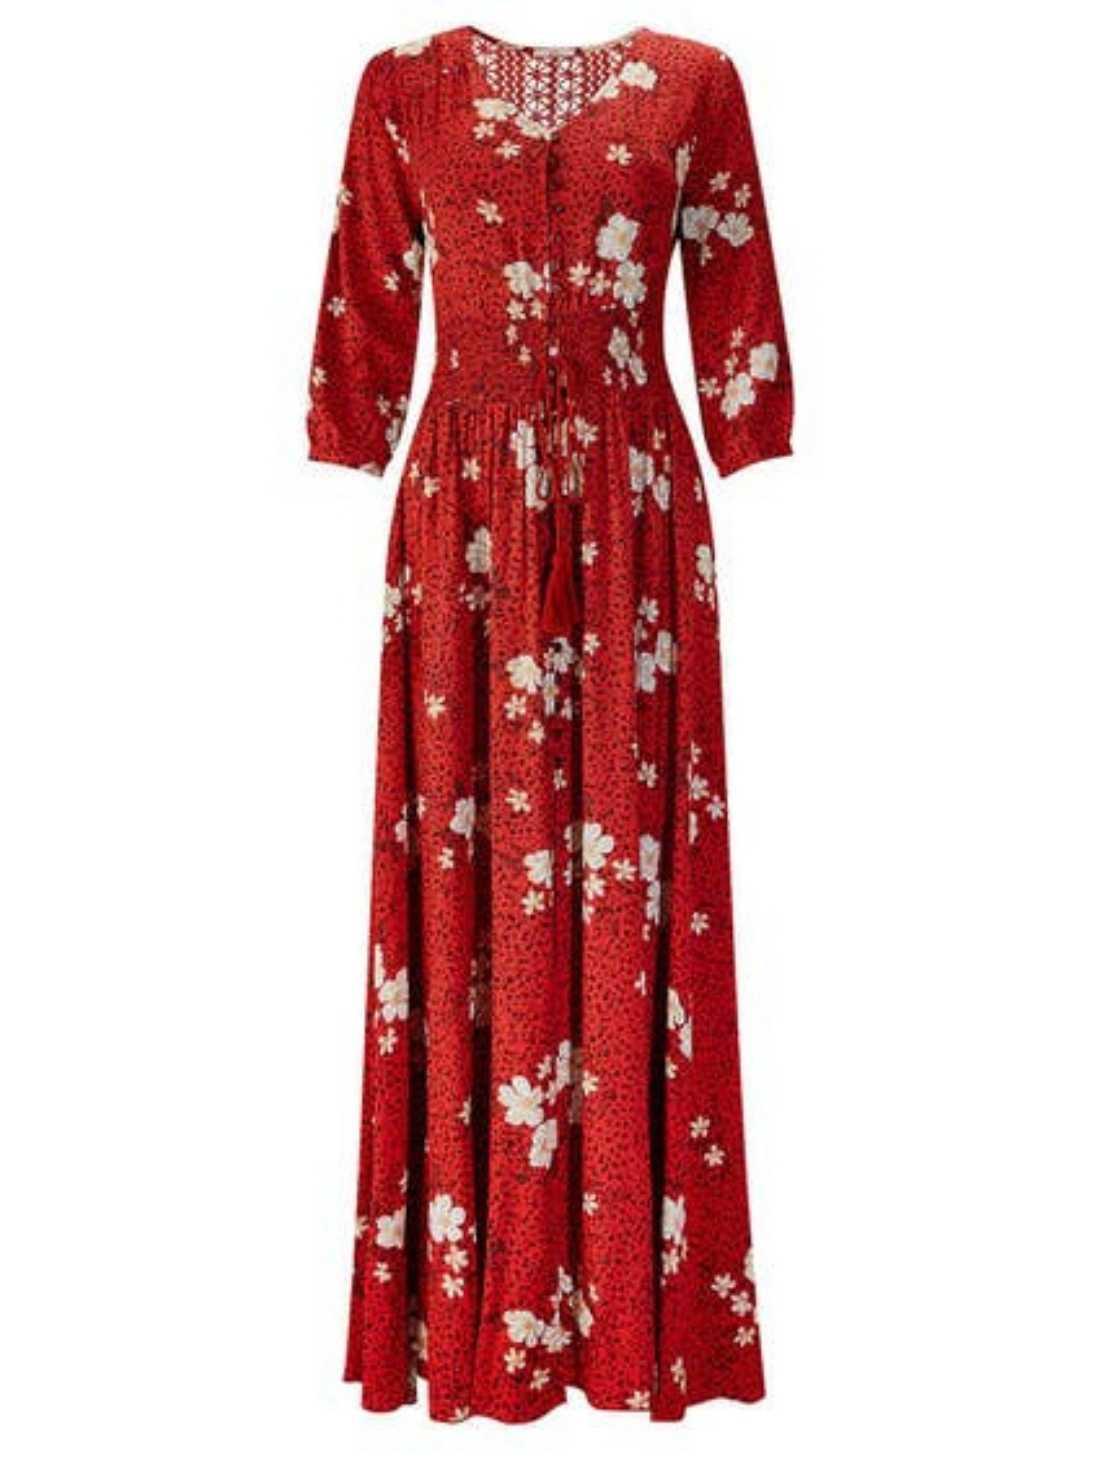 Elegant boho dress